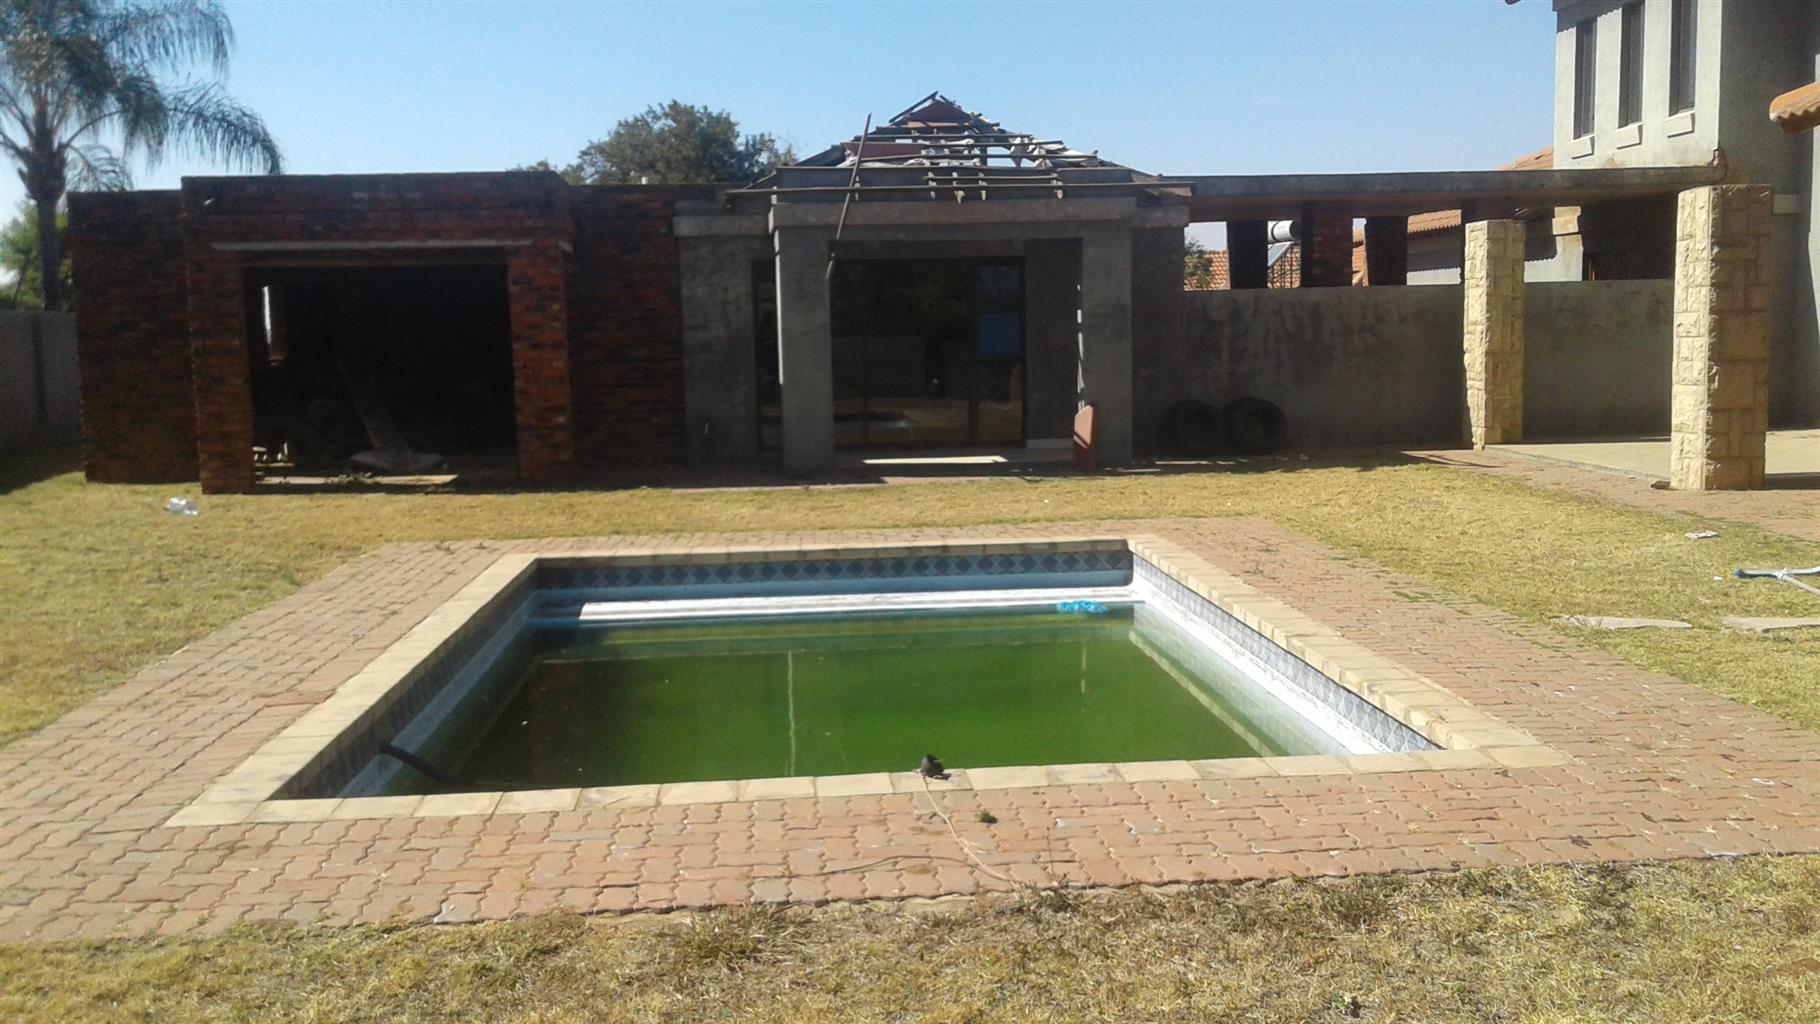 5 BEDROOMS FOR SALE HAARTEBEESPORT BIRDWOOD ESTATE IFAFI R1 950 000.00 CALL SOPHY FOR MORE INFO 0760813571